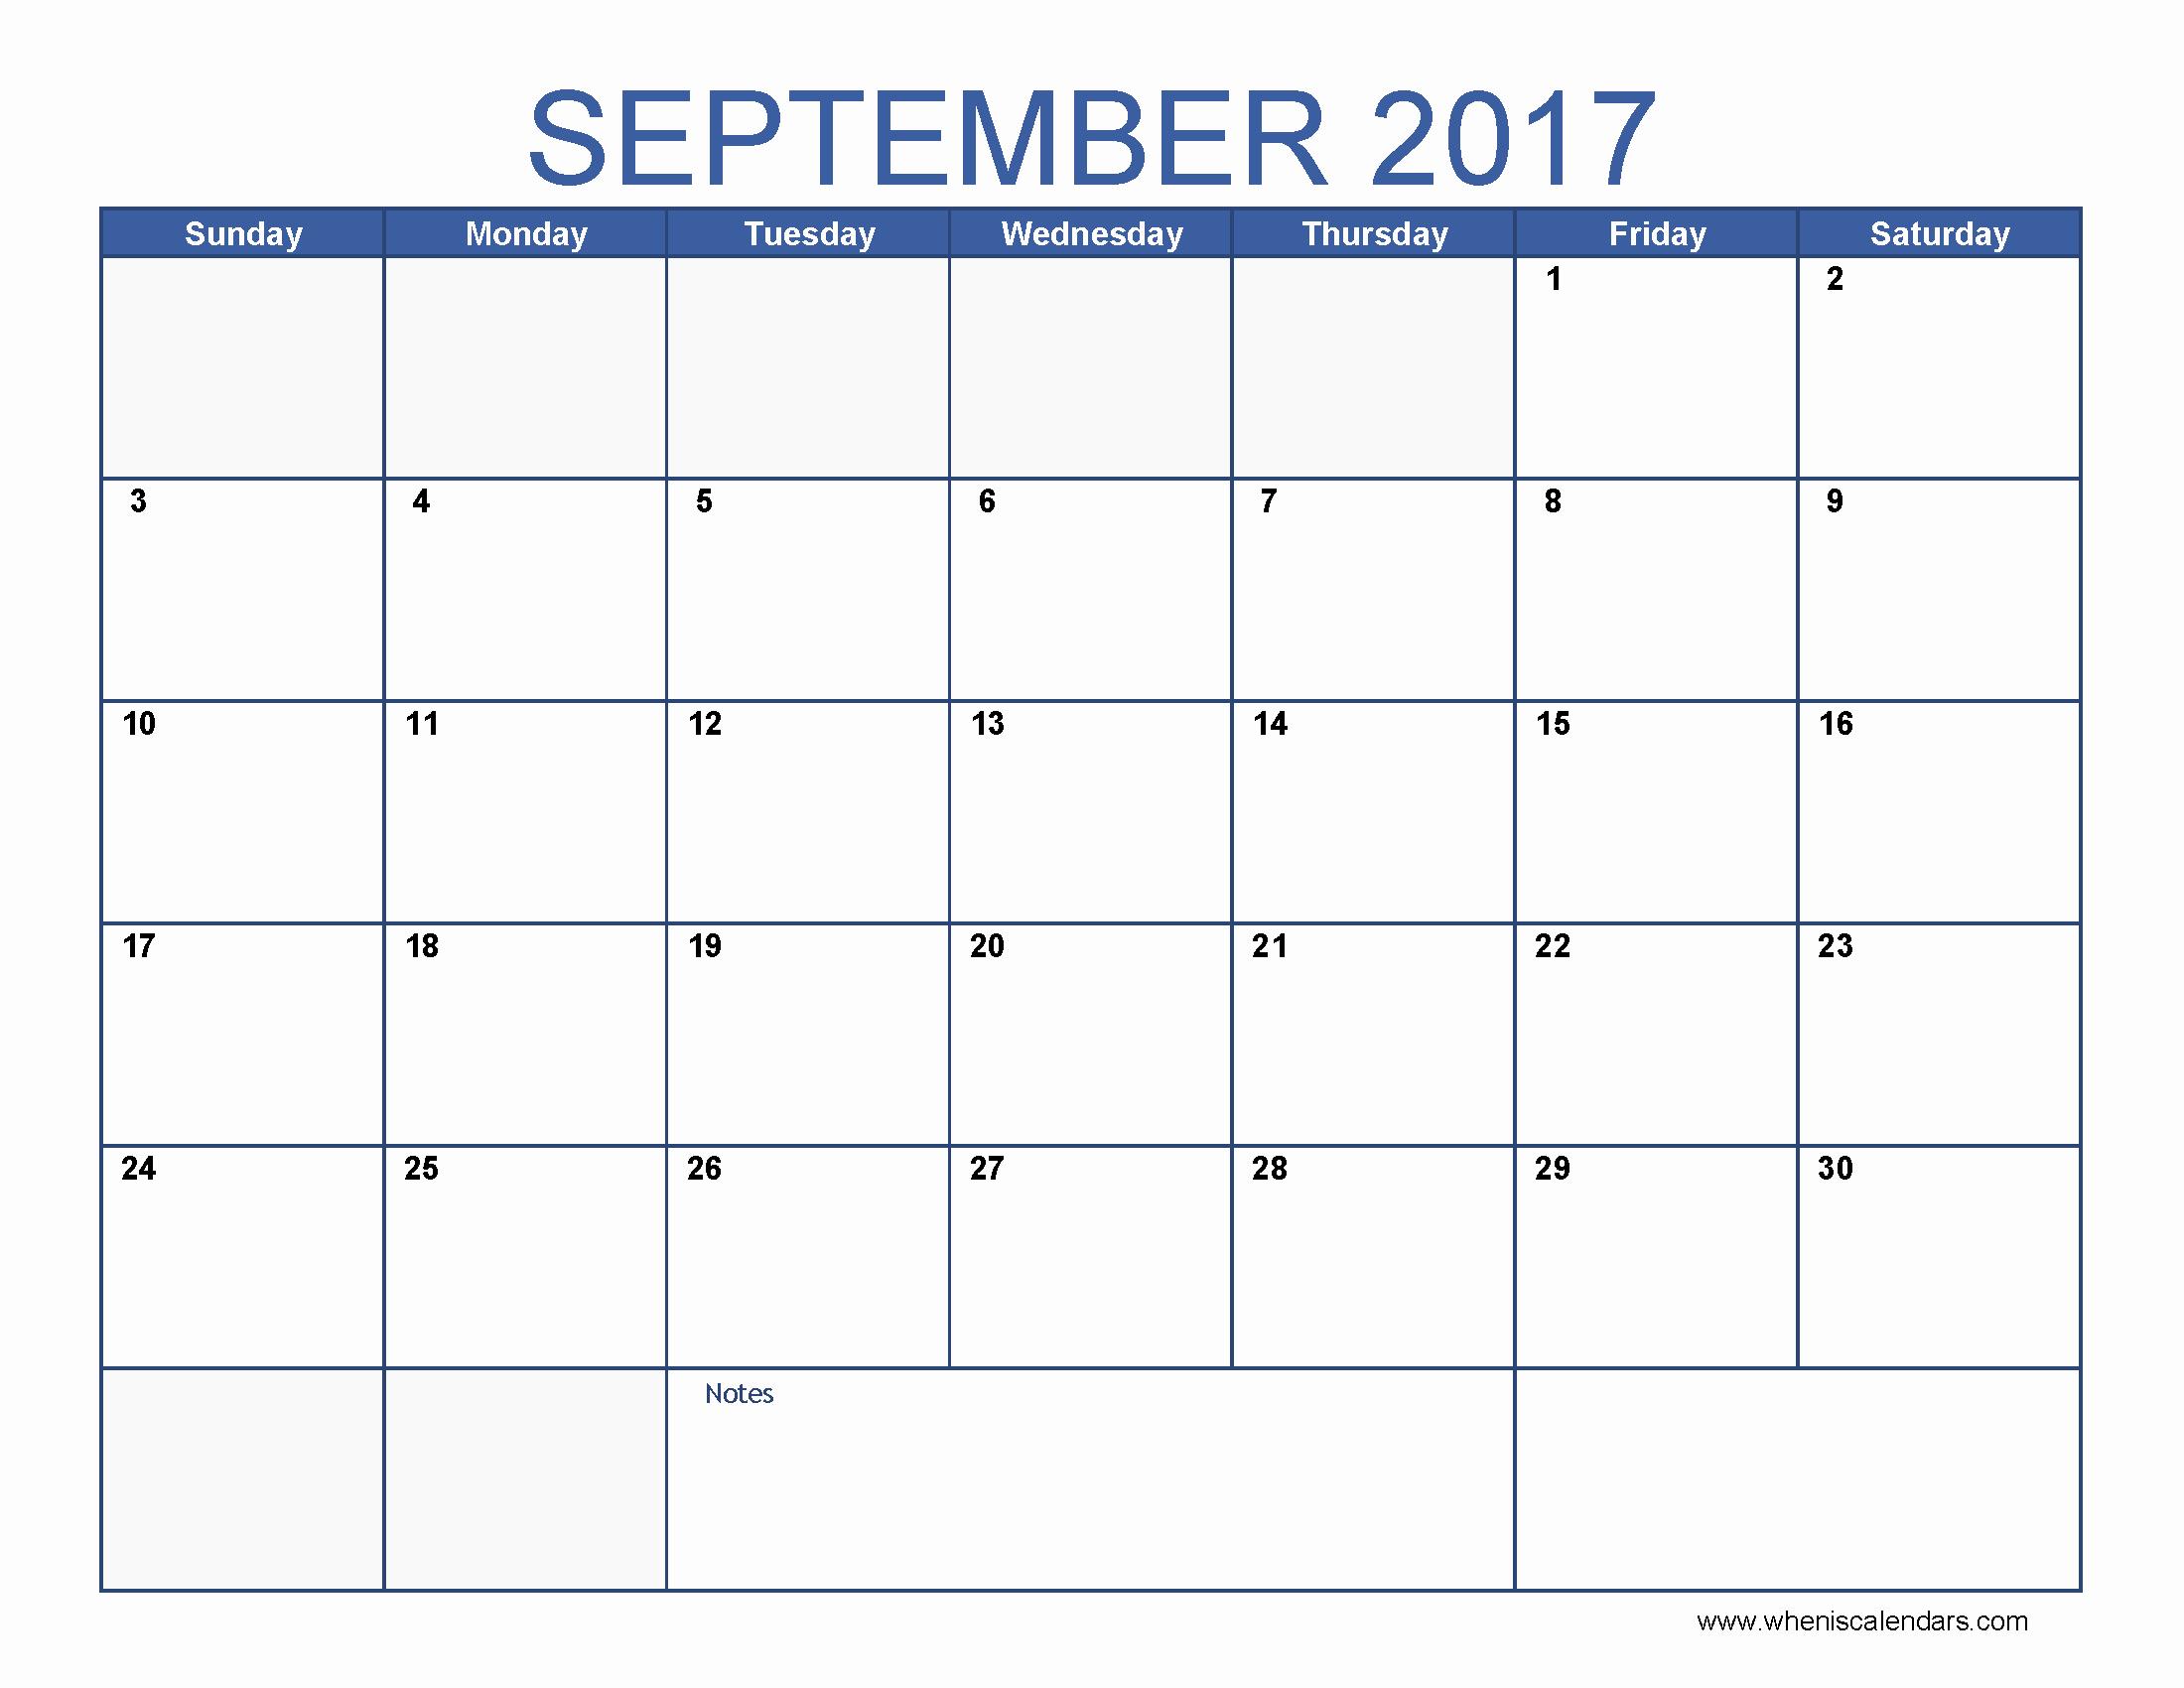 September 2017 Printable Calendar Word Inspirational September 2017 Calendar Template